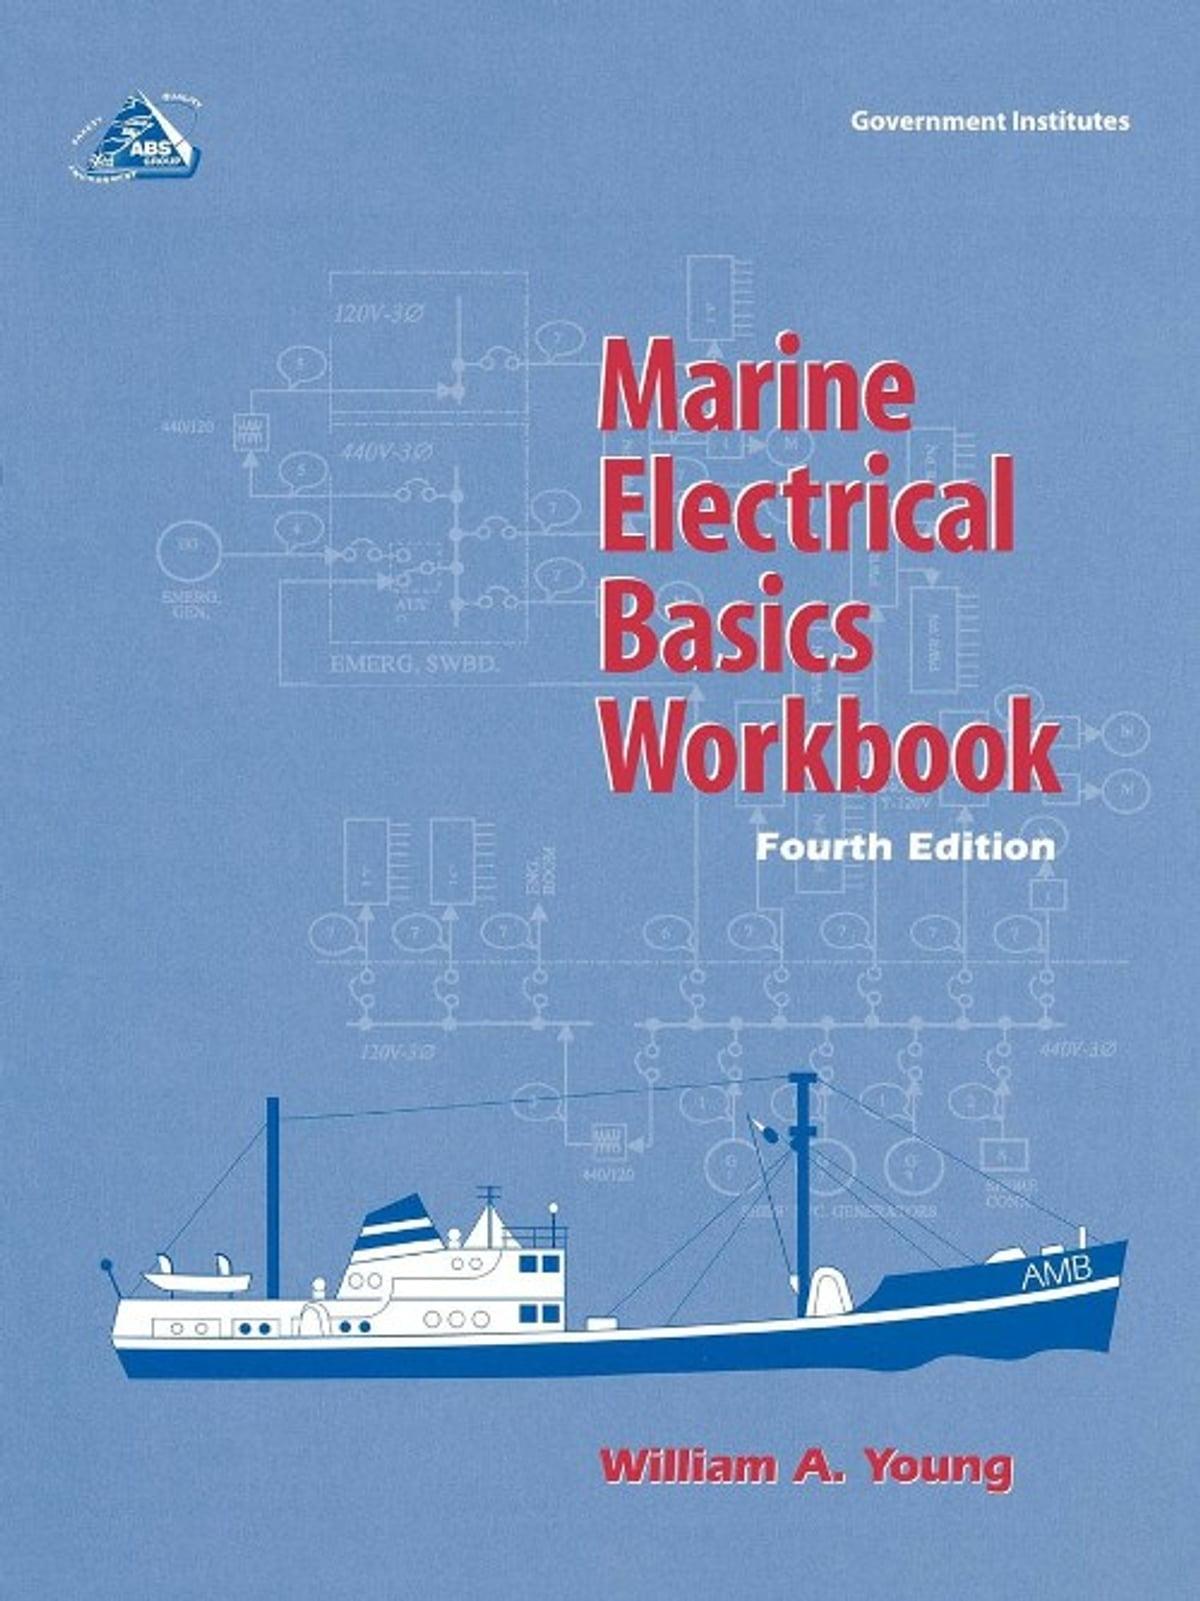 hight resolution of marine electrical basics workbook ebook by william a young 9781461624752 rakuten kobo